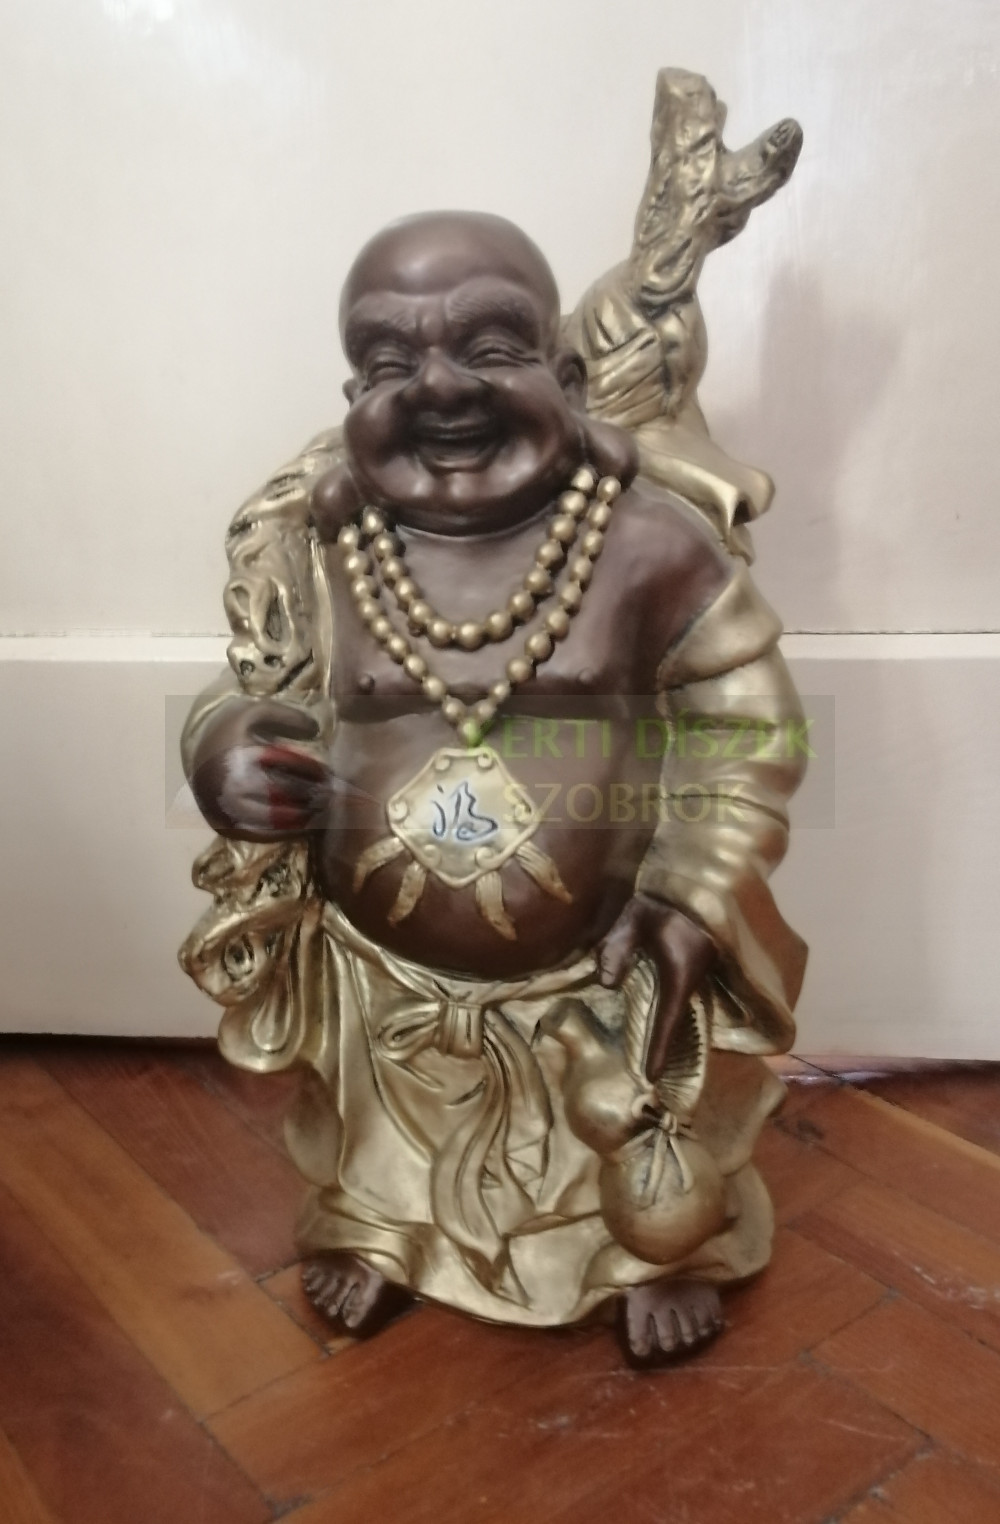 Buddha-kinai-vandor-bronz-arany-szines